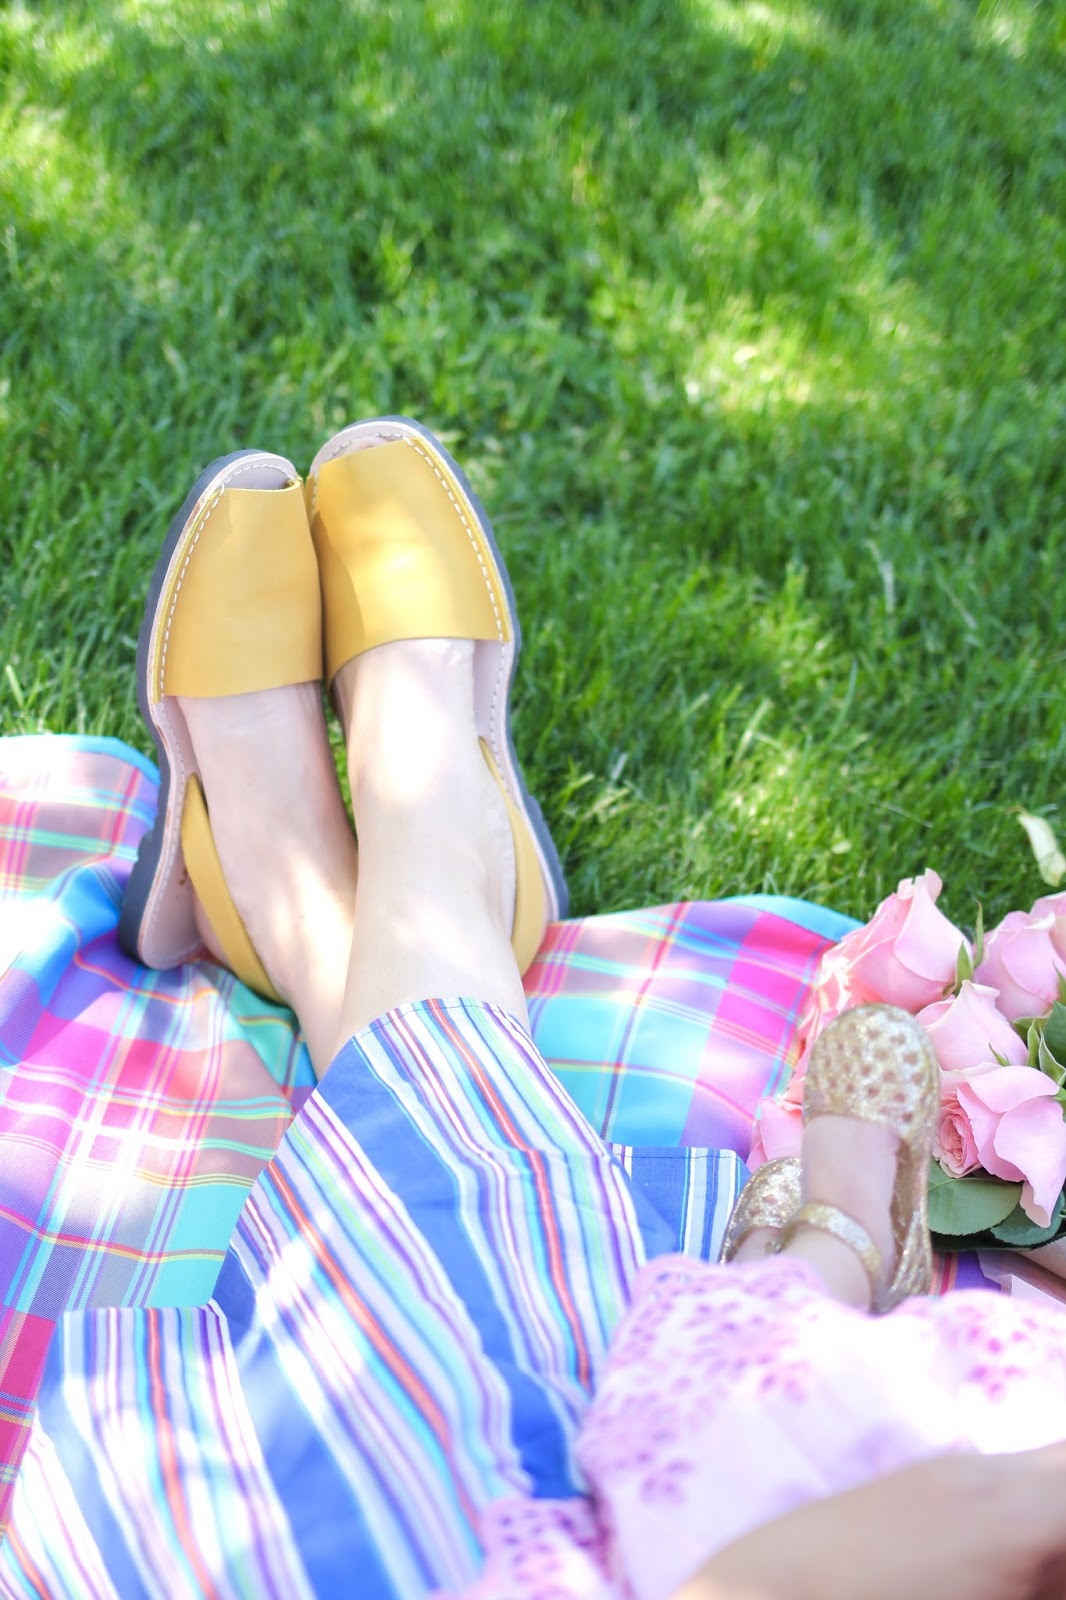 avarca pons, international peace garden, baby gap eyelet dress. off the shoulder dress, mothers day